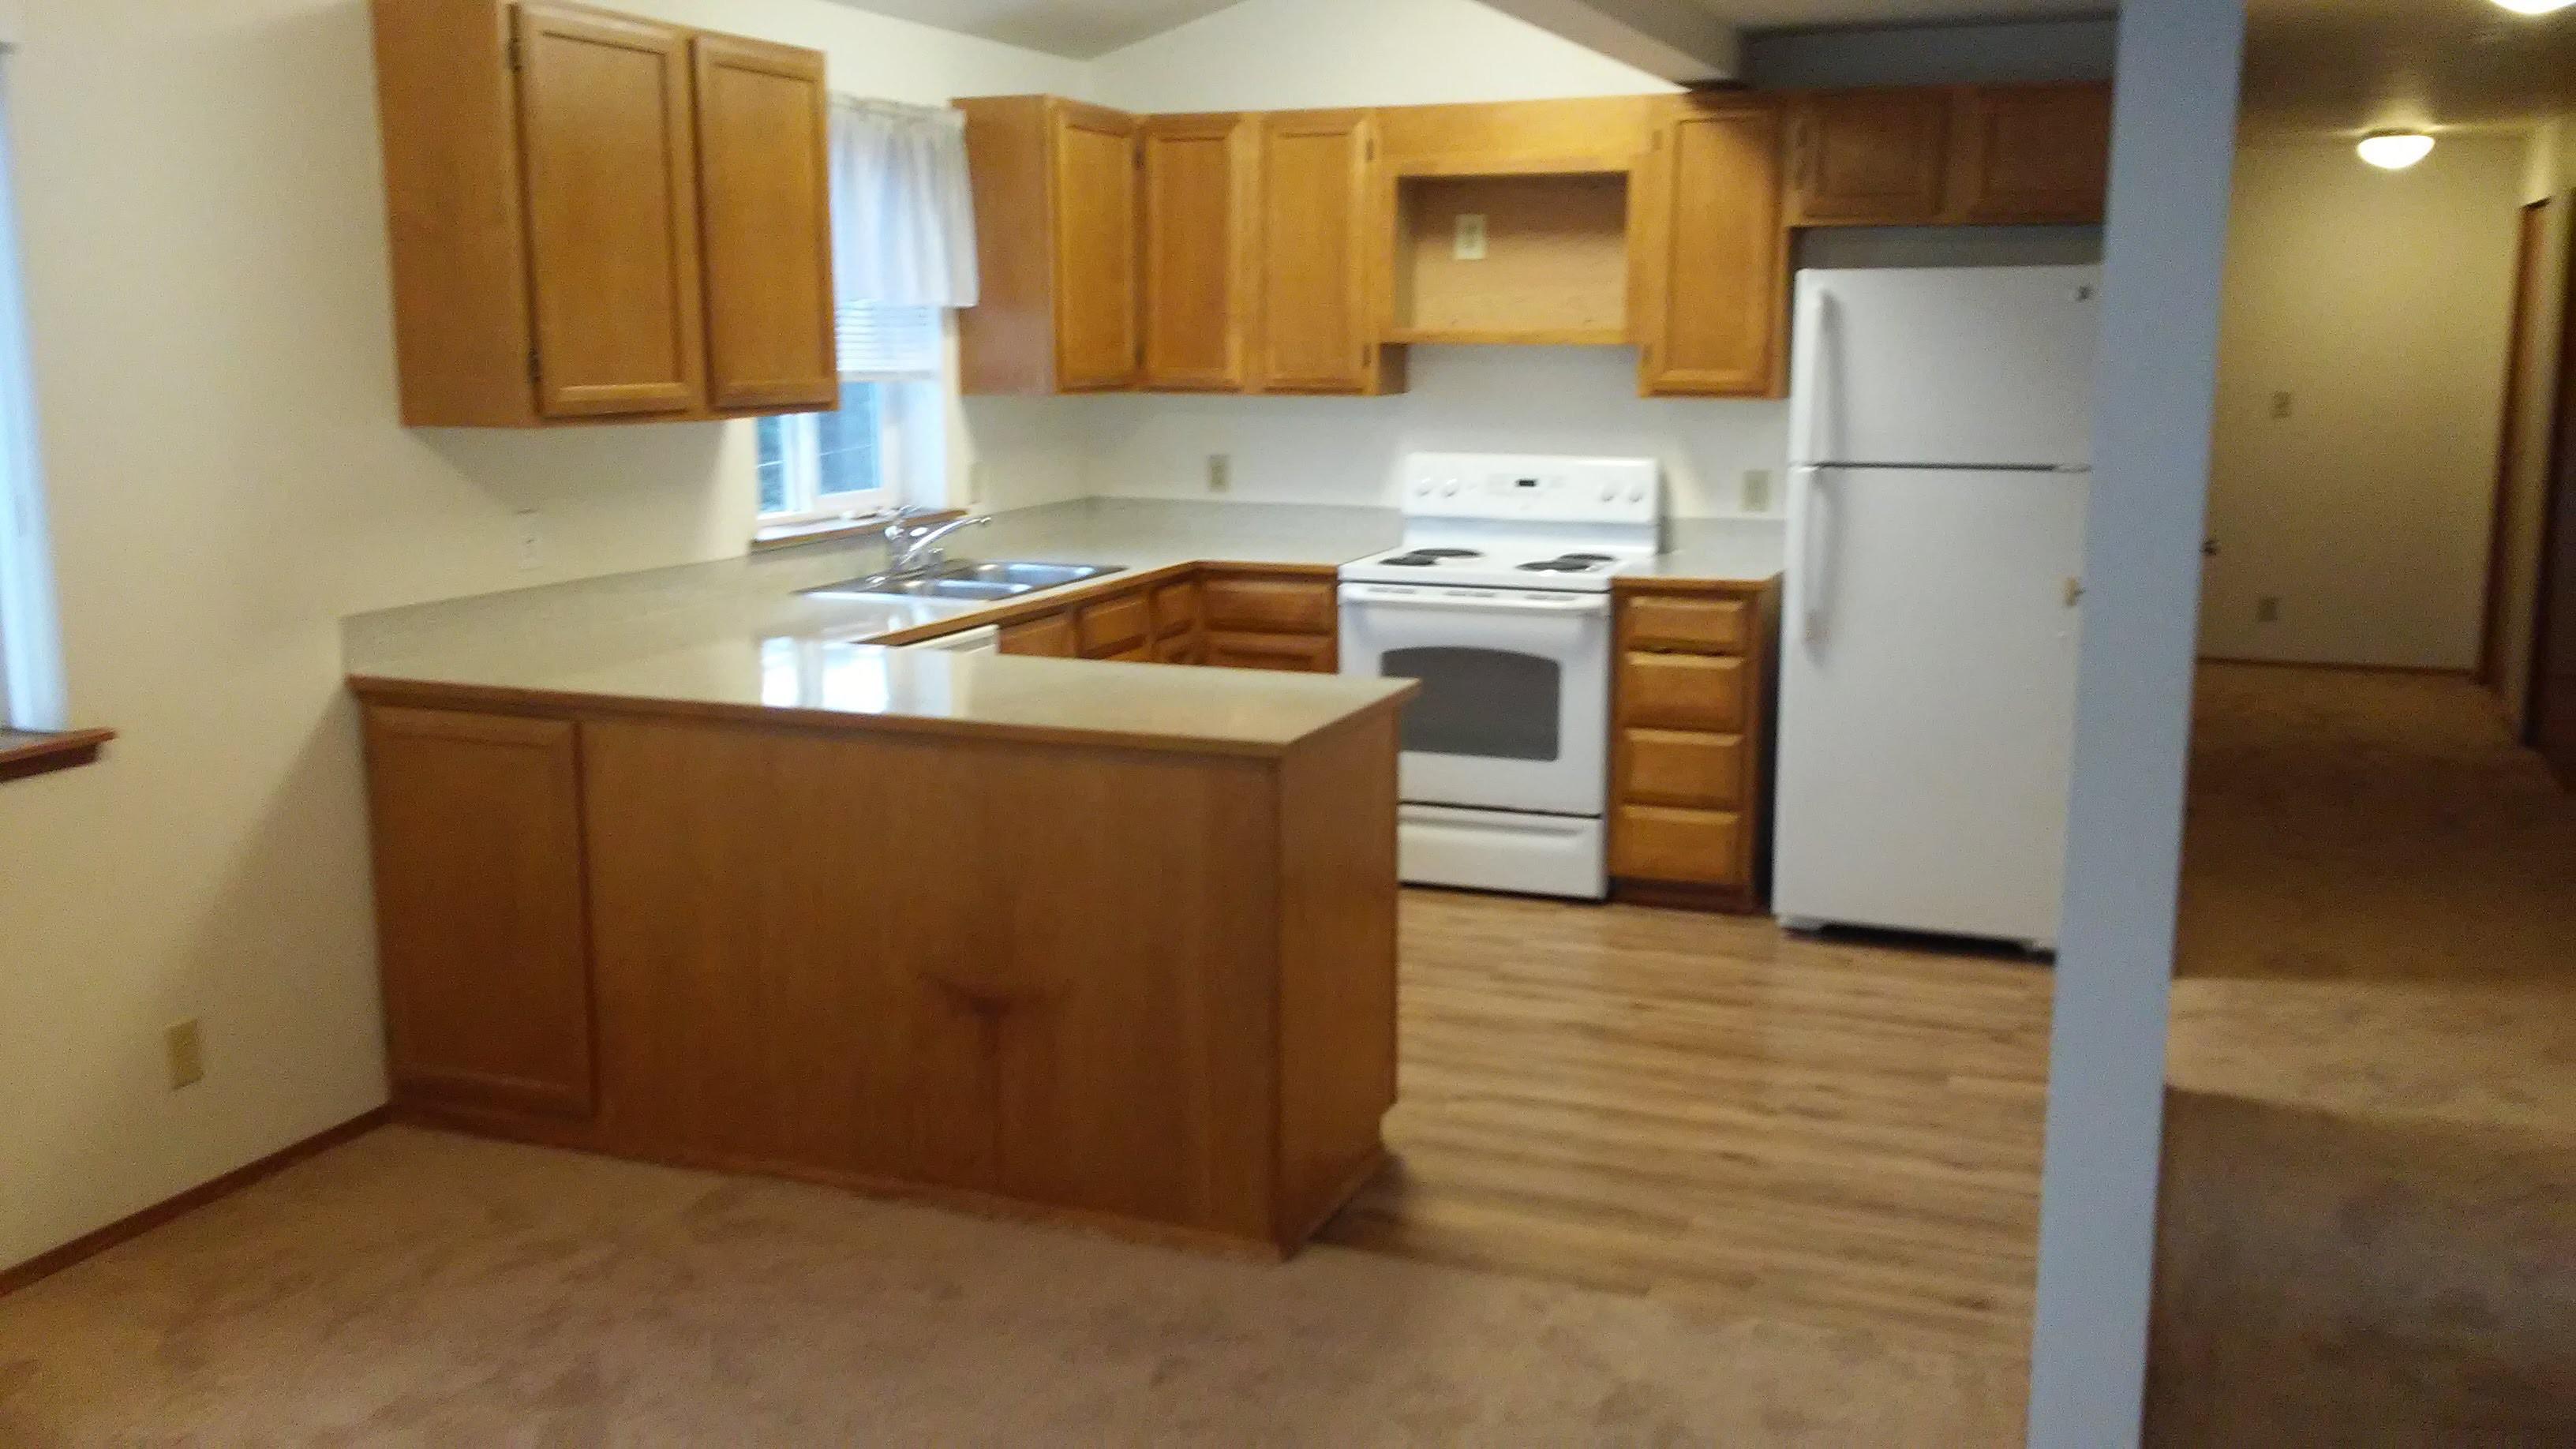 Apartments Near UW 9403 Linden Apartments for University of Washington Students in Seattle, WA